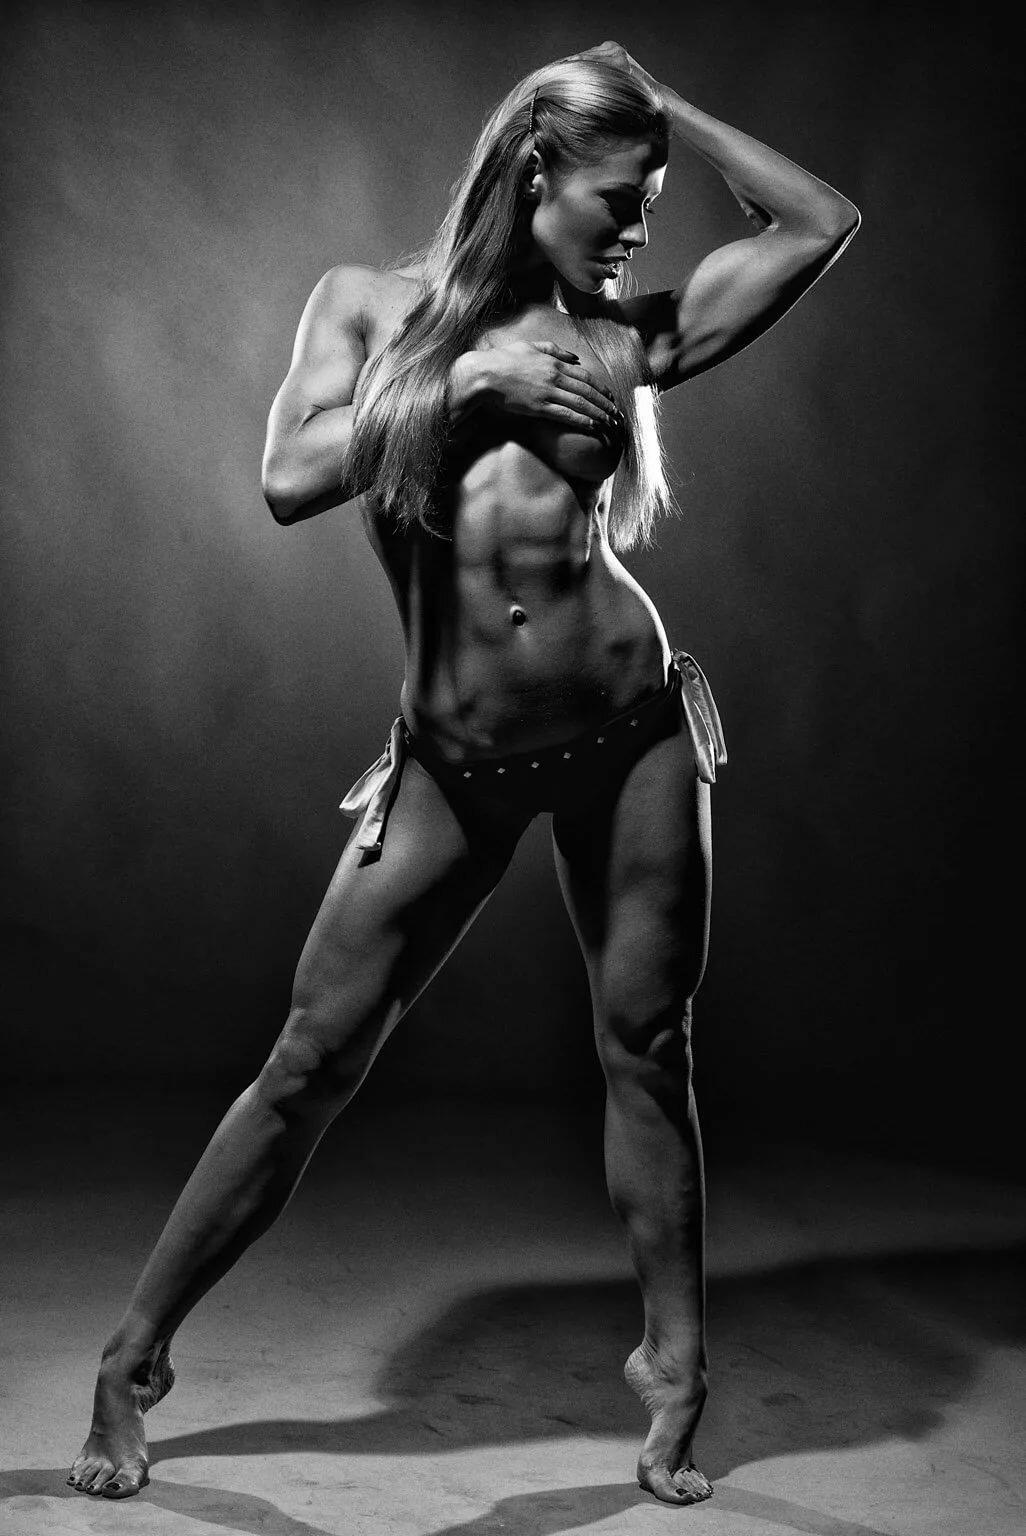 Nude Muscle Worship